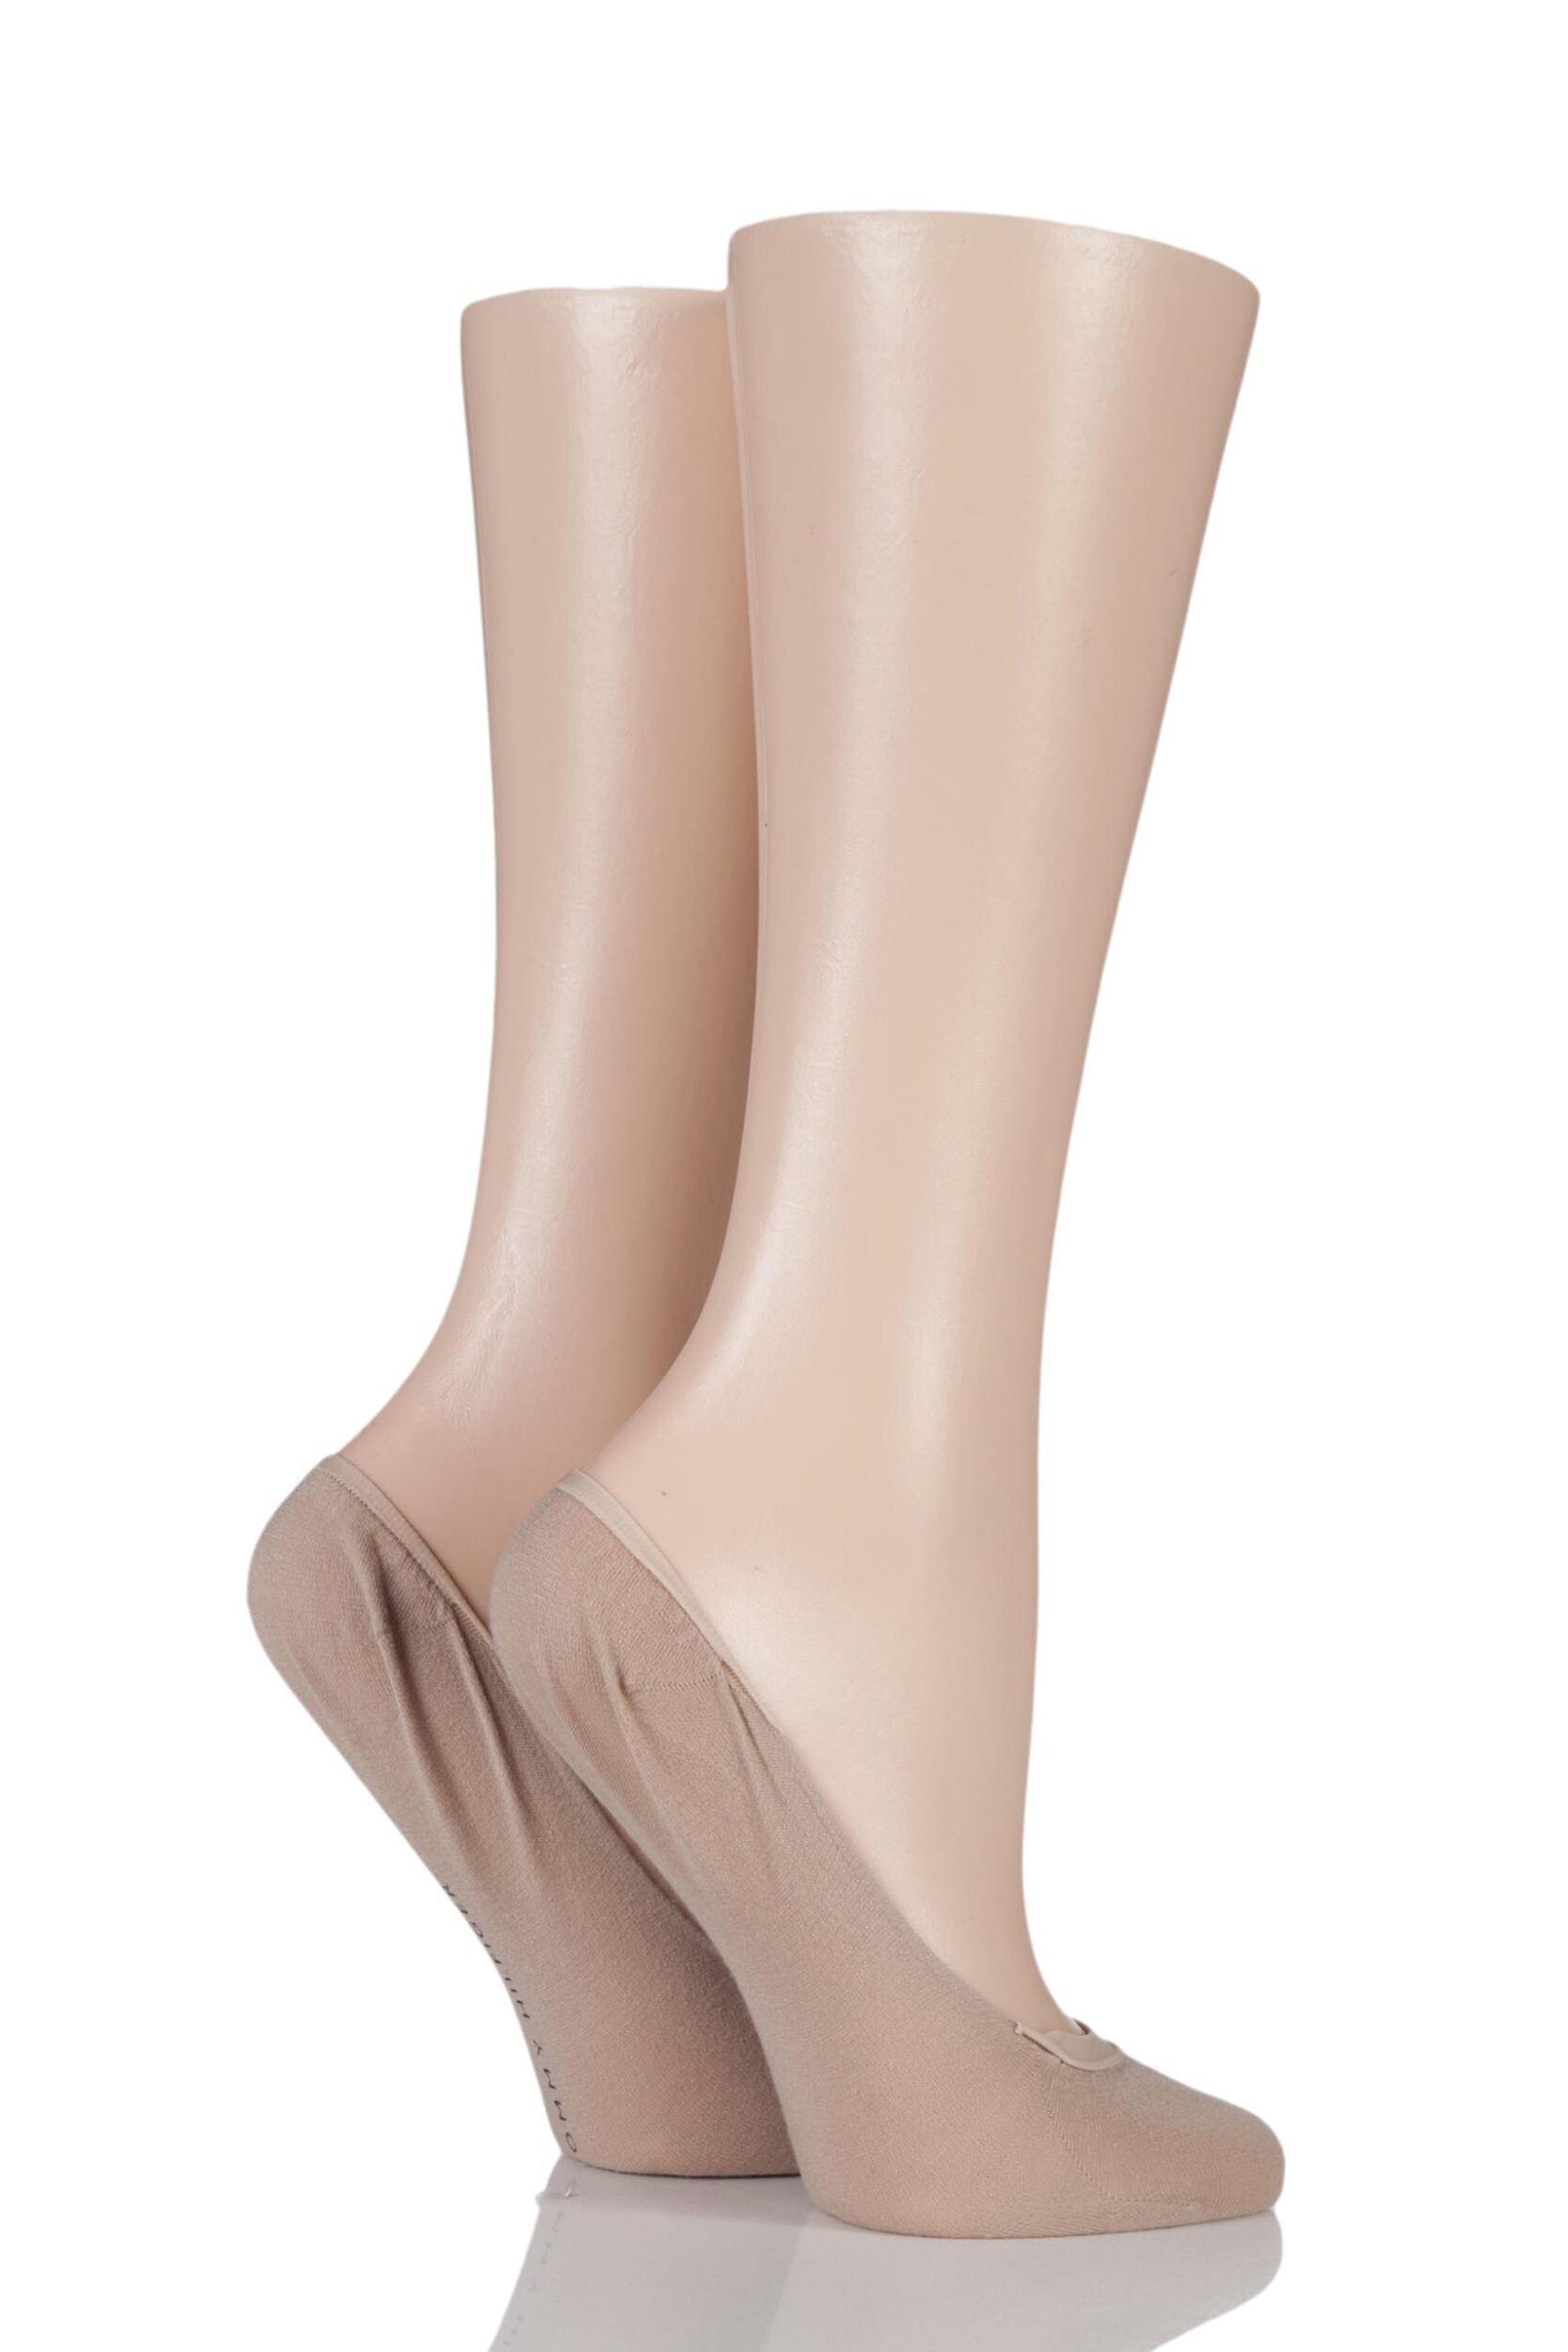 ladies 2 pair tommy hilfiger ballerina footies socks ebay. Black Bedroom Furniture Sets. Home Design Ideas